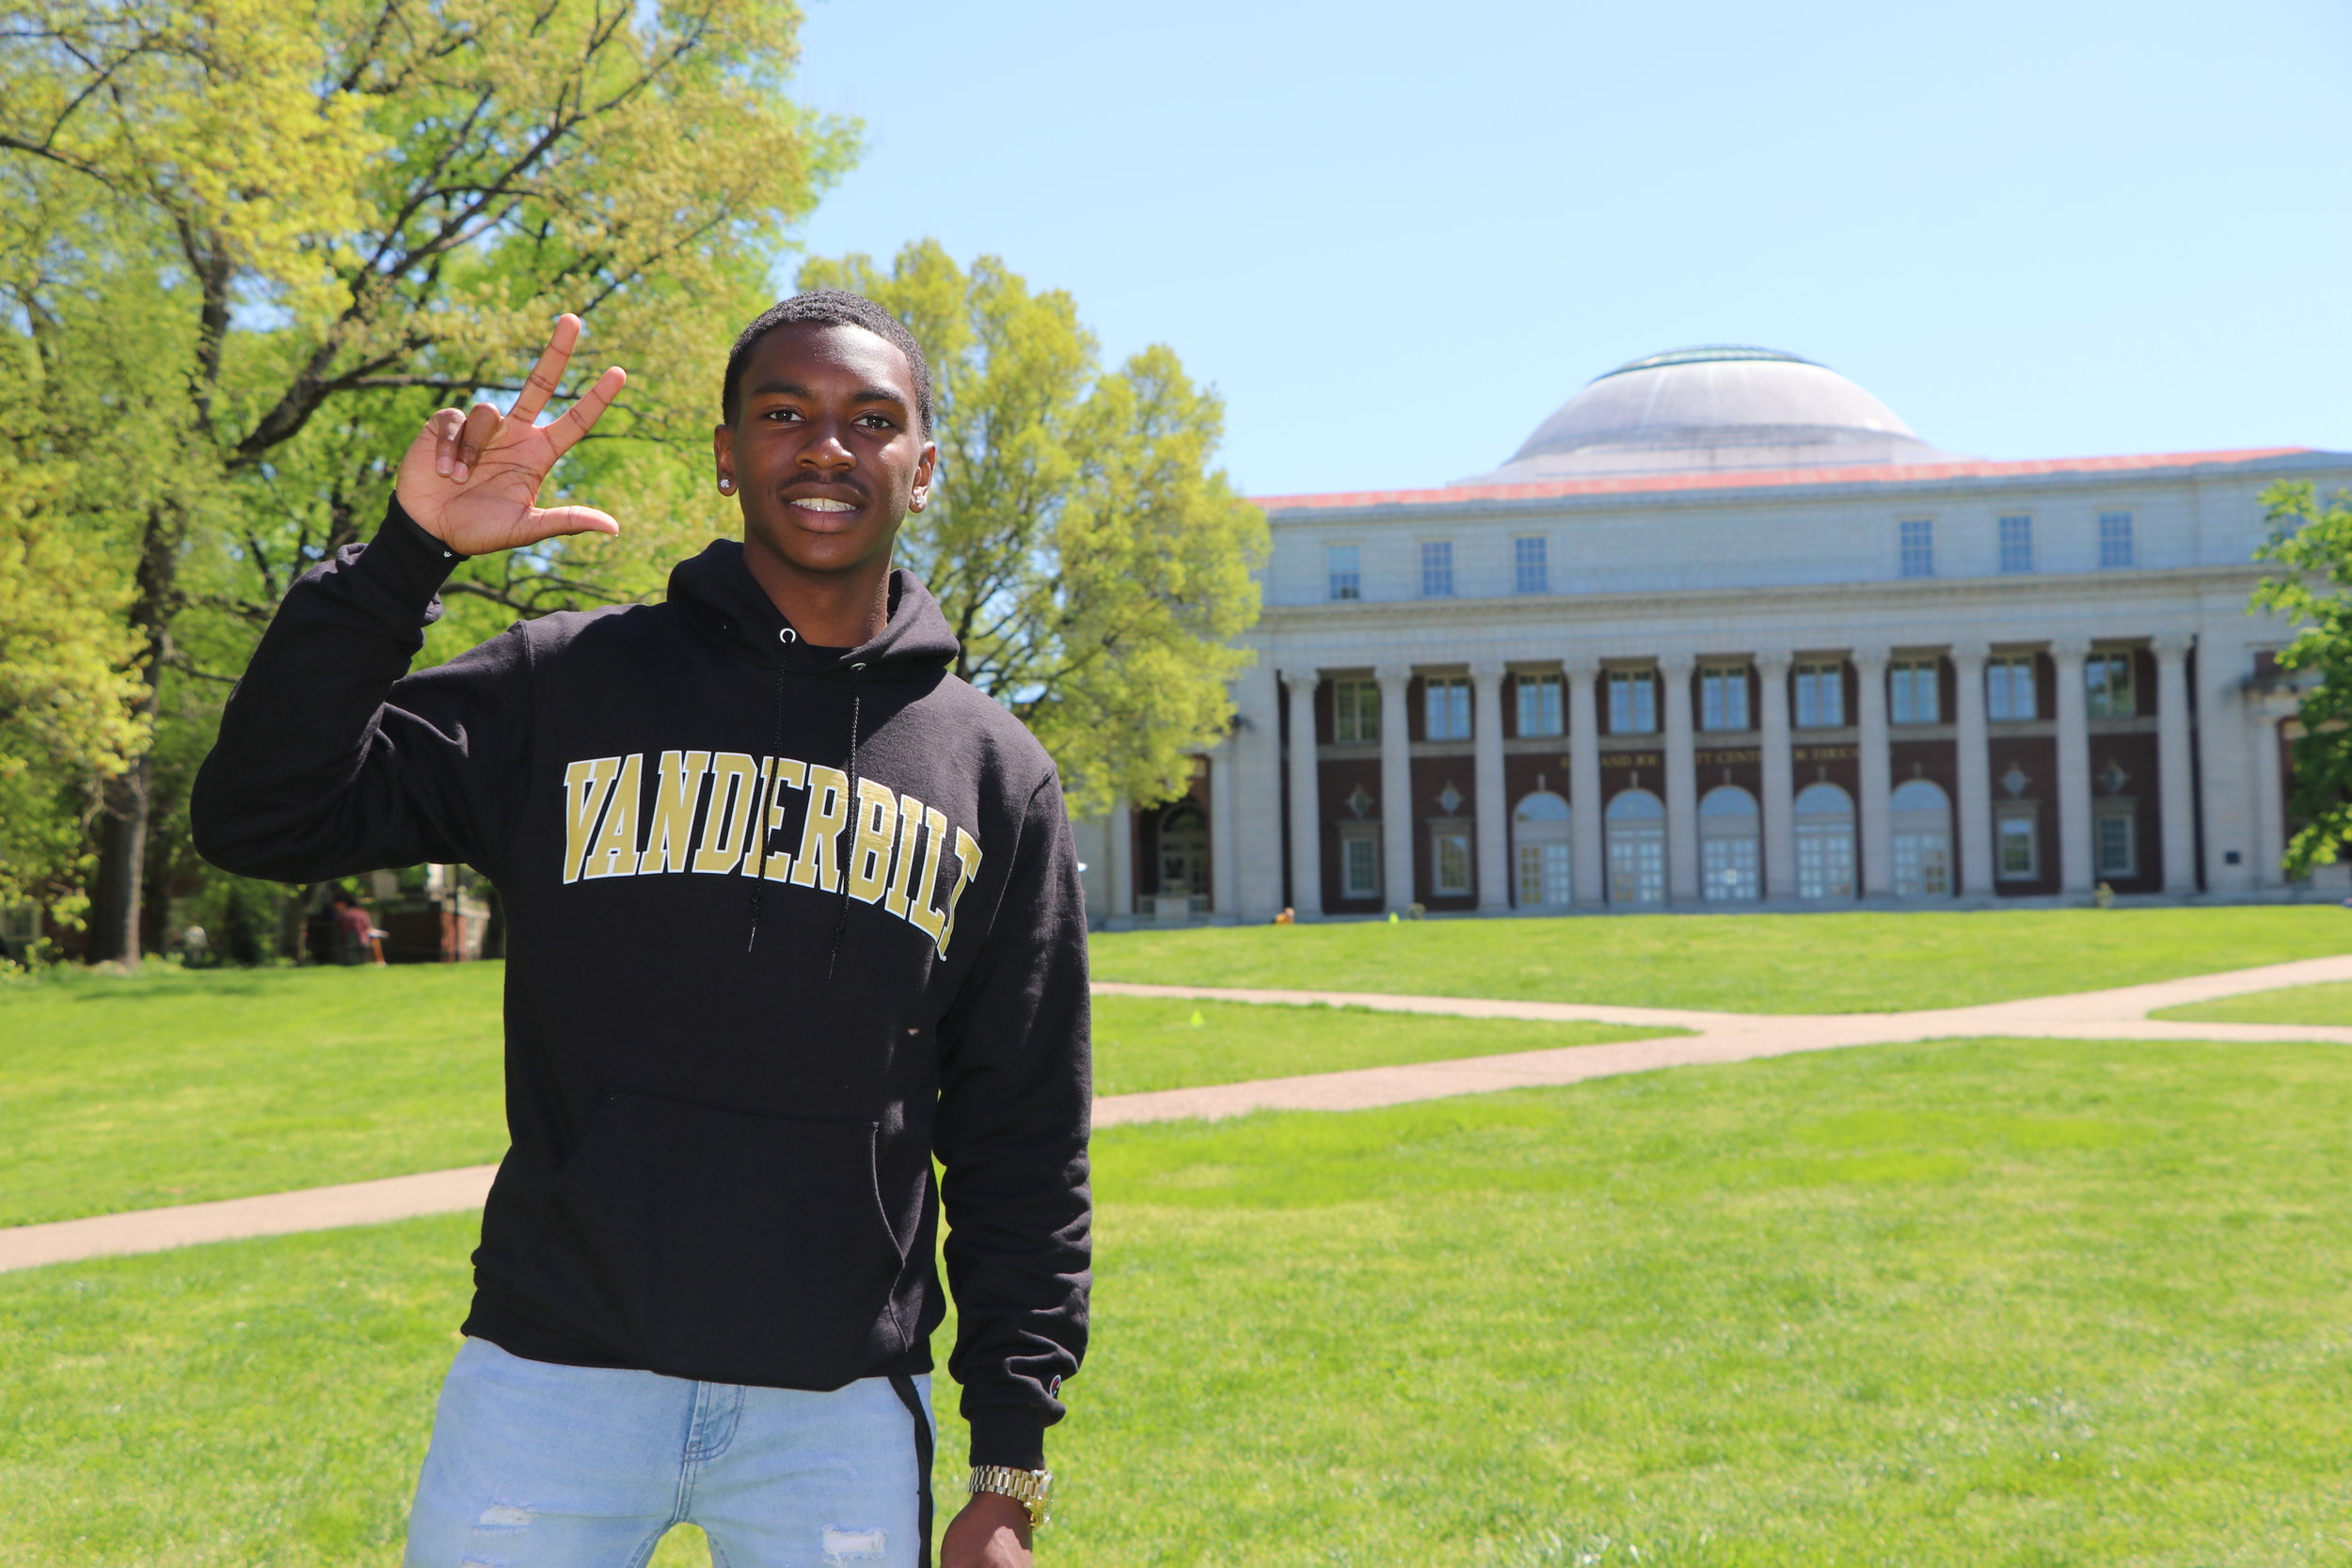 Scholar Story Example - #Vanderbilt #FutureEngineer #Ambition